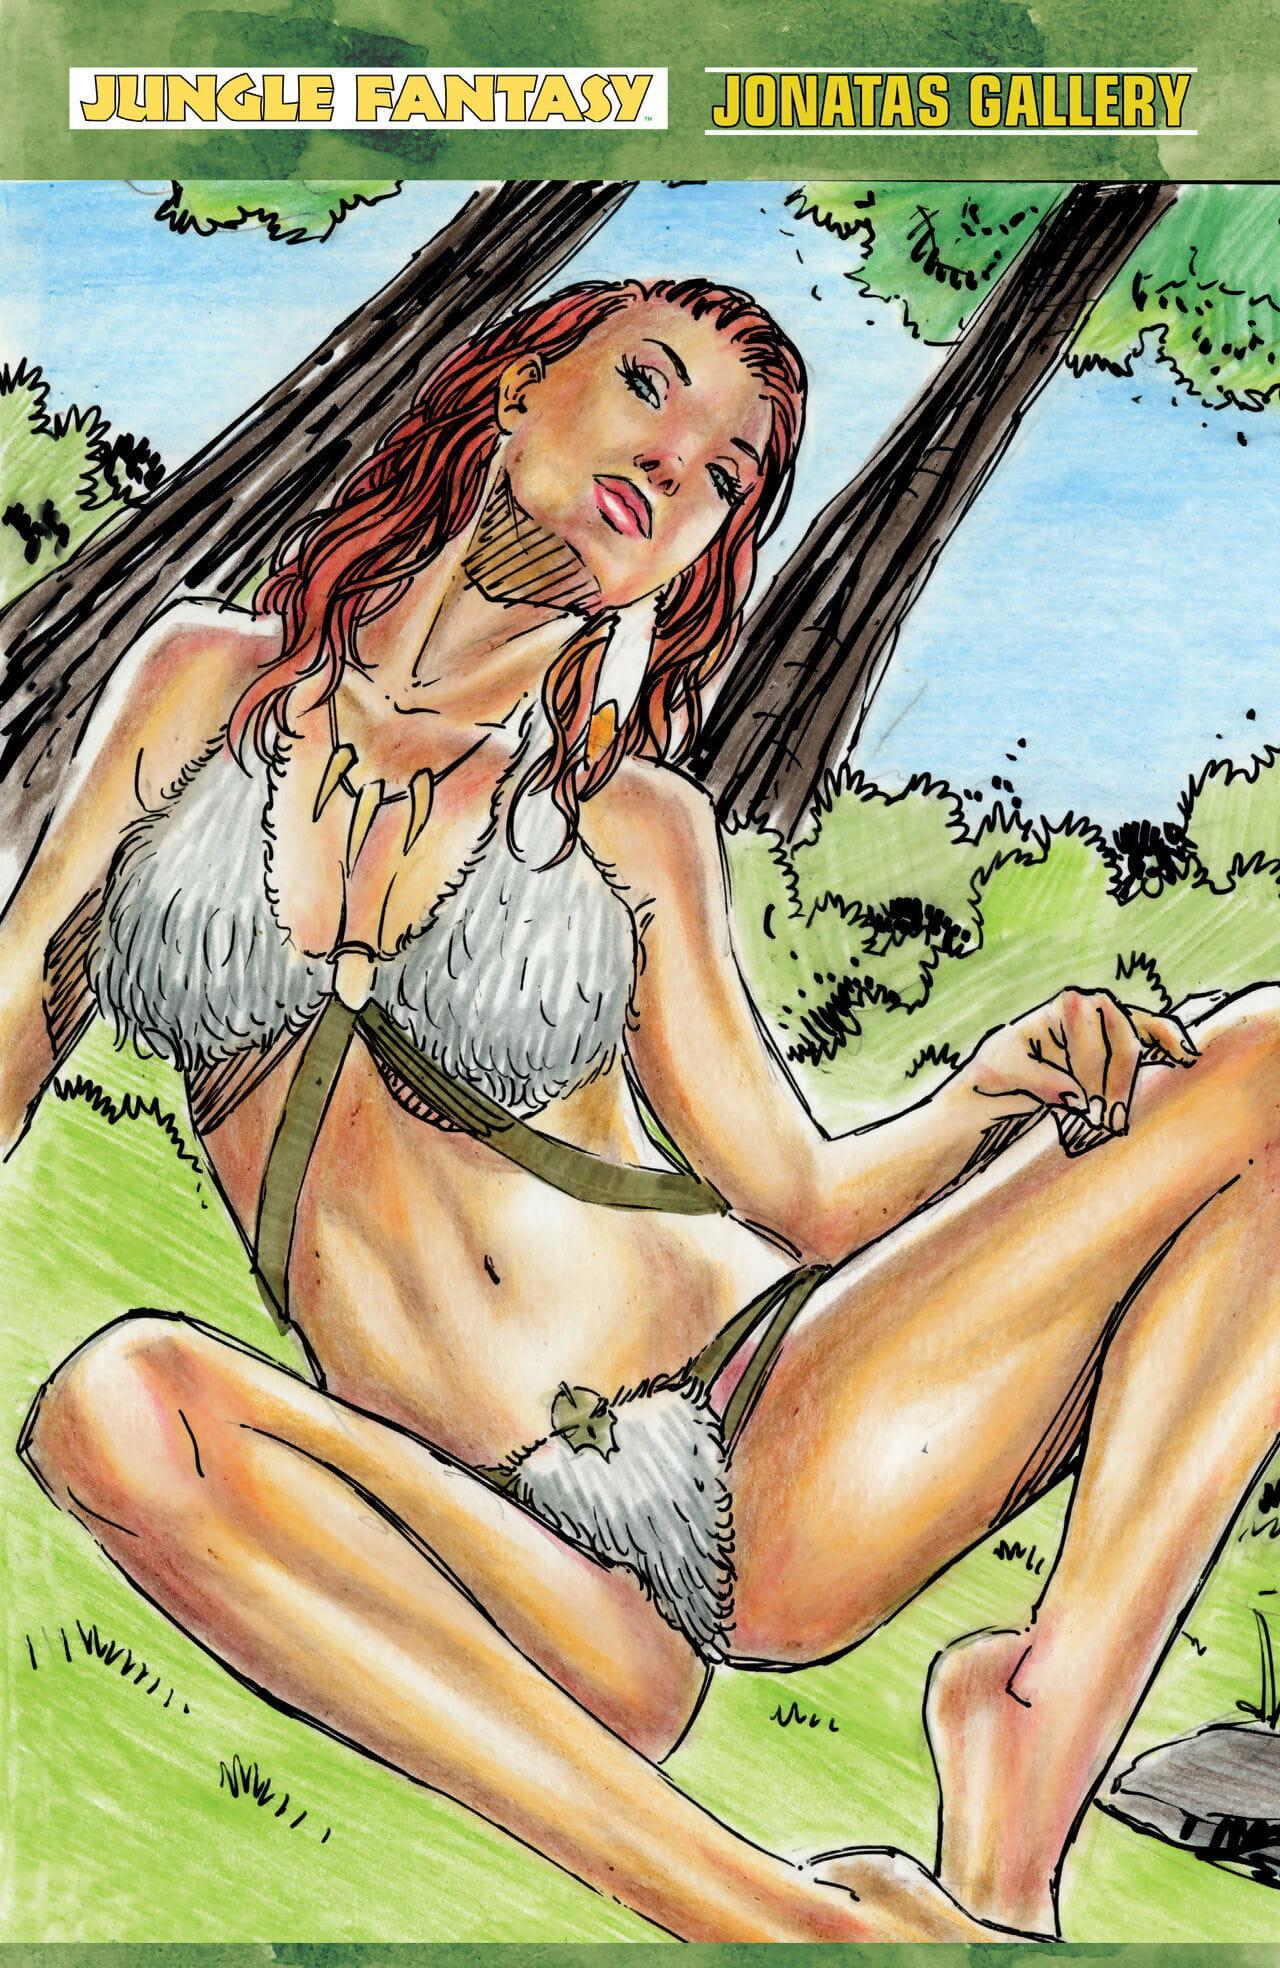 Net profit Fantasy꧇ Beauties - fidelity 2